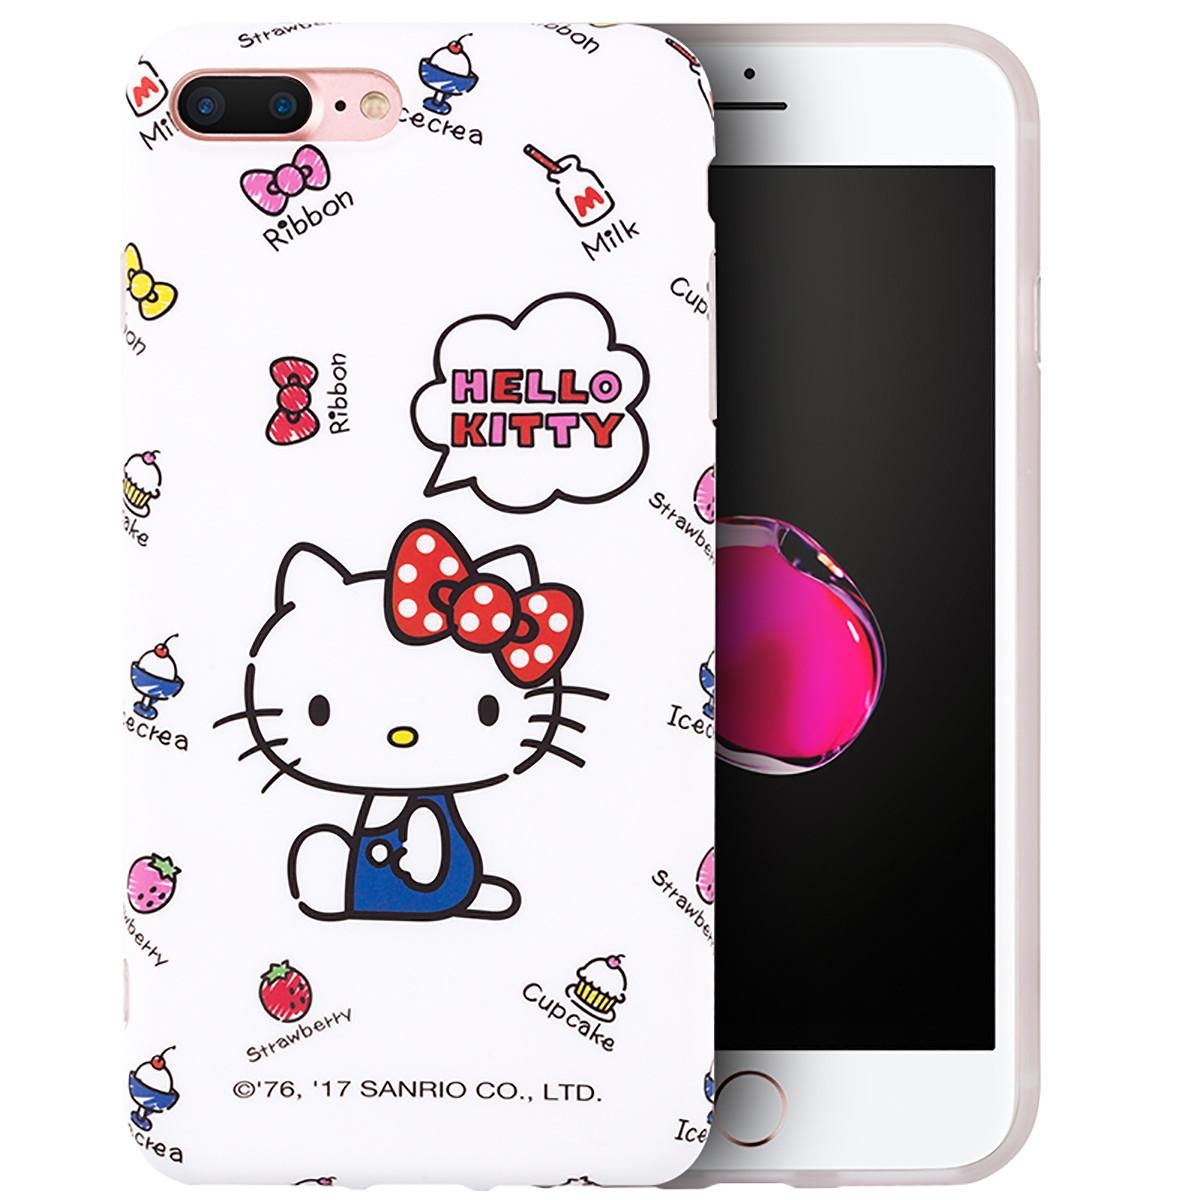 hello kitty 唯品会_HELLO KITTY苹果8plus手机壳iphone8/7plus全包防摔保护套WKT-IMD0203_唯品会